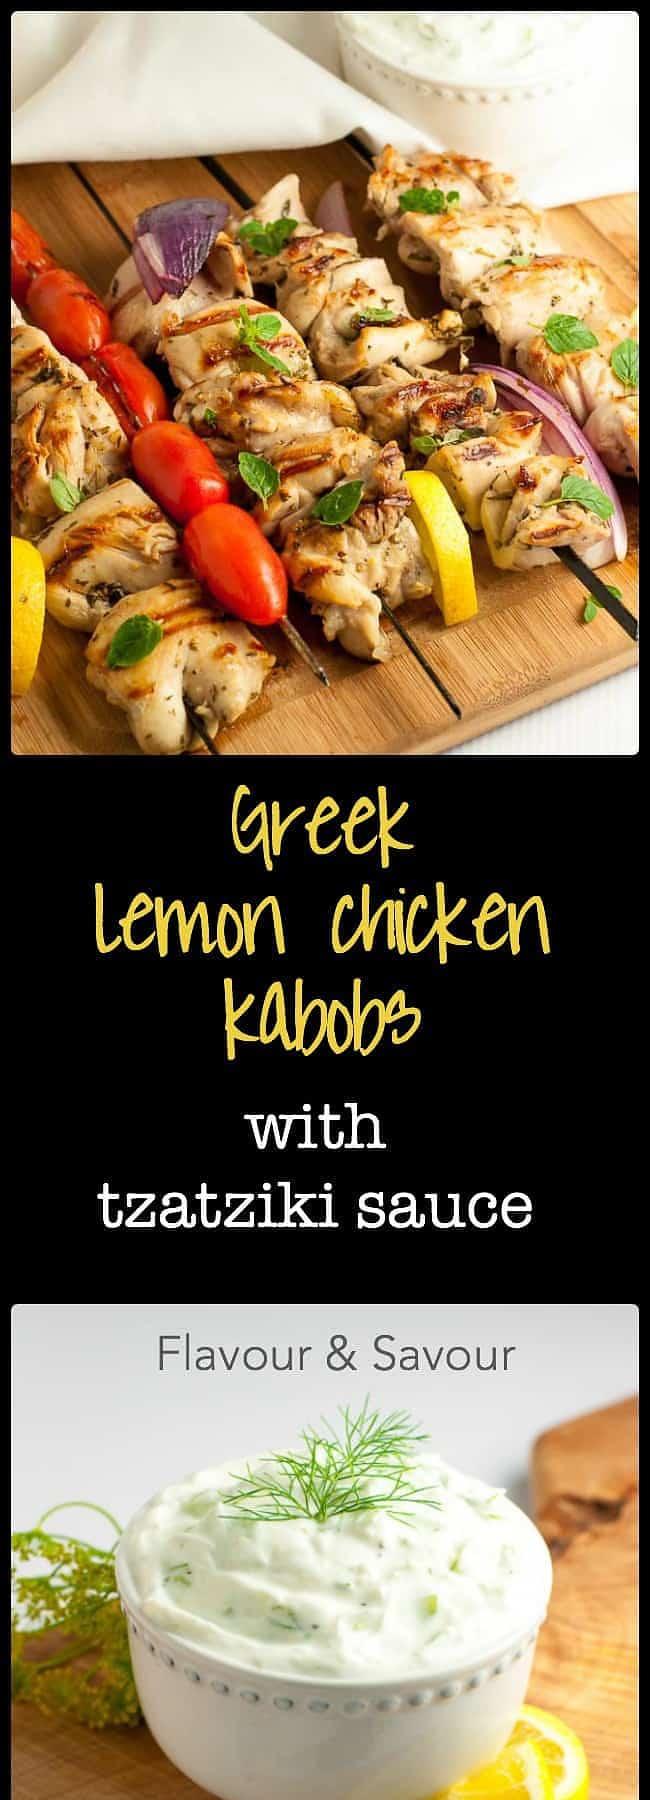 Greek Lemon Chicken Kabobs with homemade Tzatziki Sauce. Fresh herbs, lemon, garlic and red wine vinegar make a fabulous marinade for juicy, succulent chicken skewers. |www.flavourandsavour.com